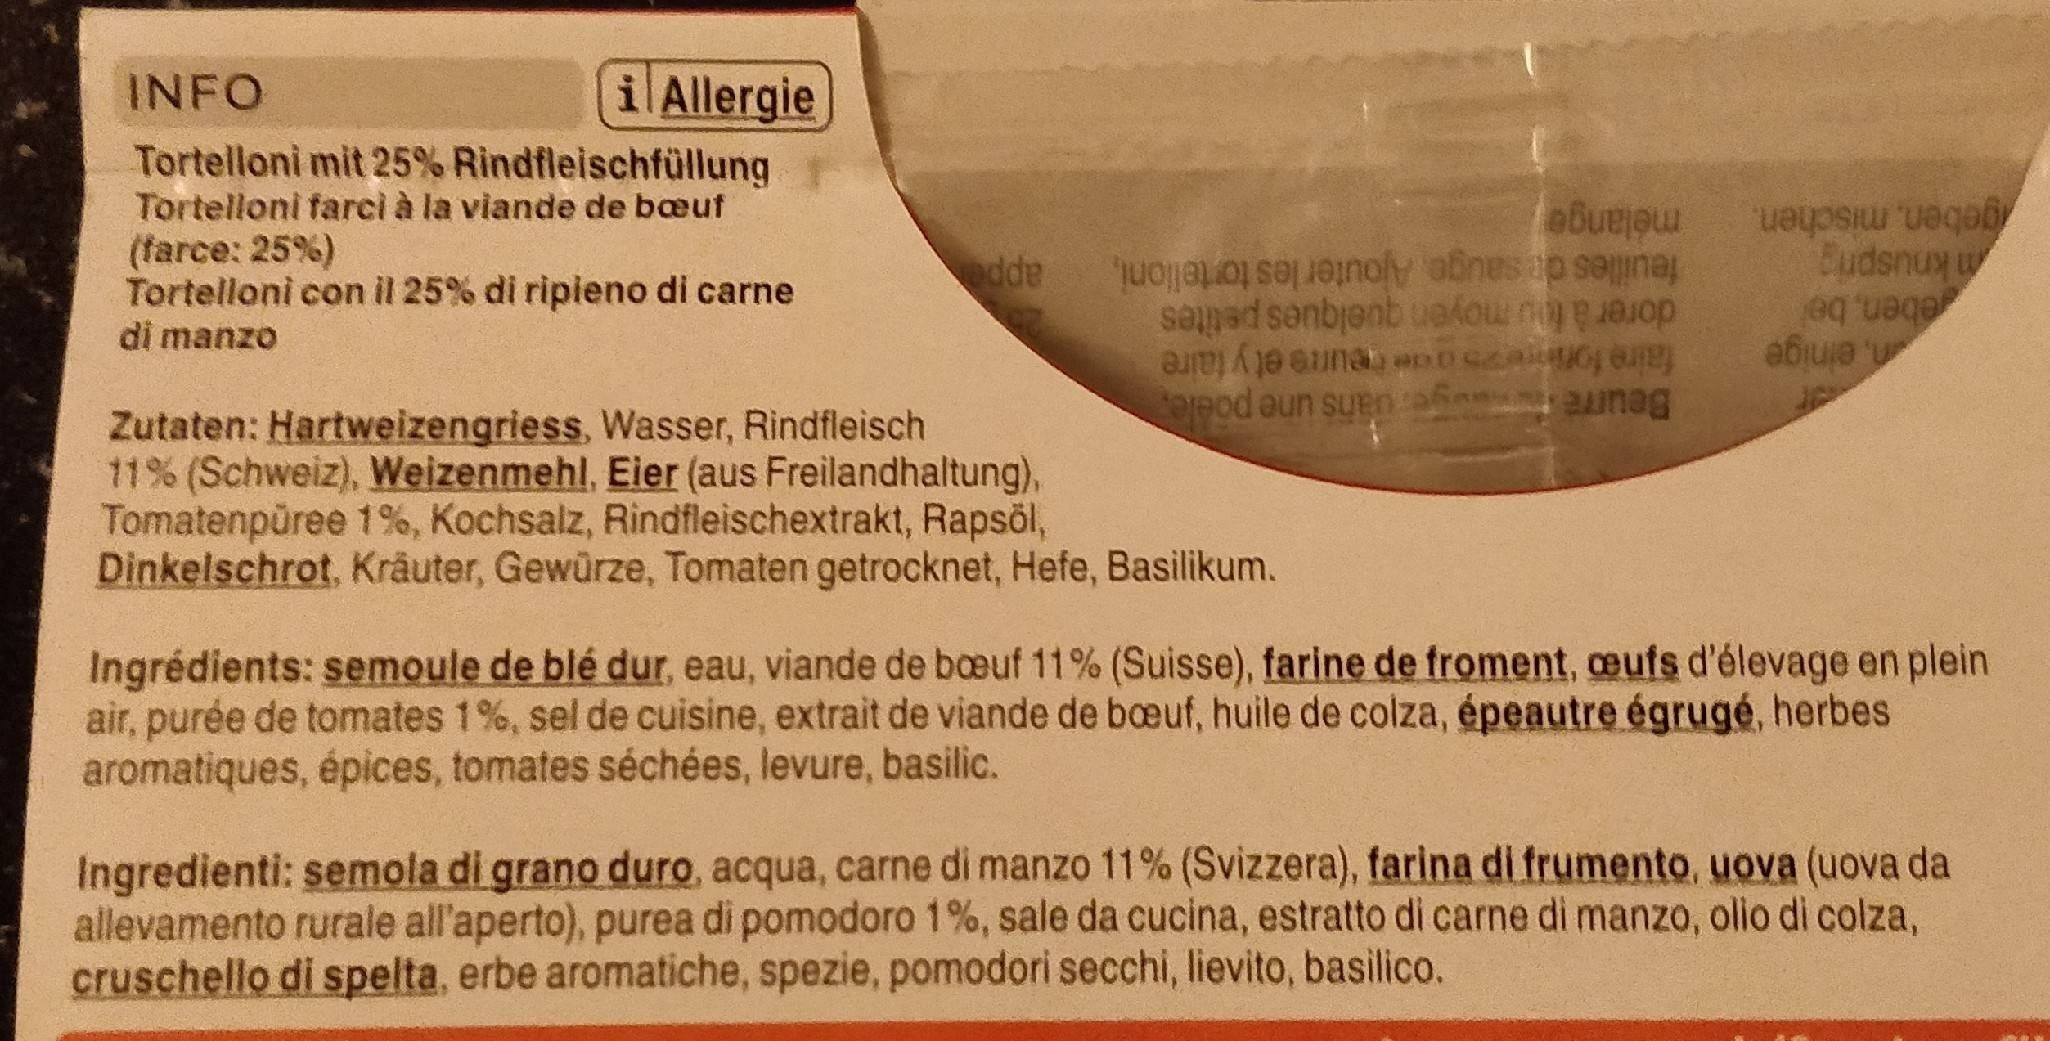 Tortelloni - Ingredients